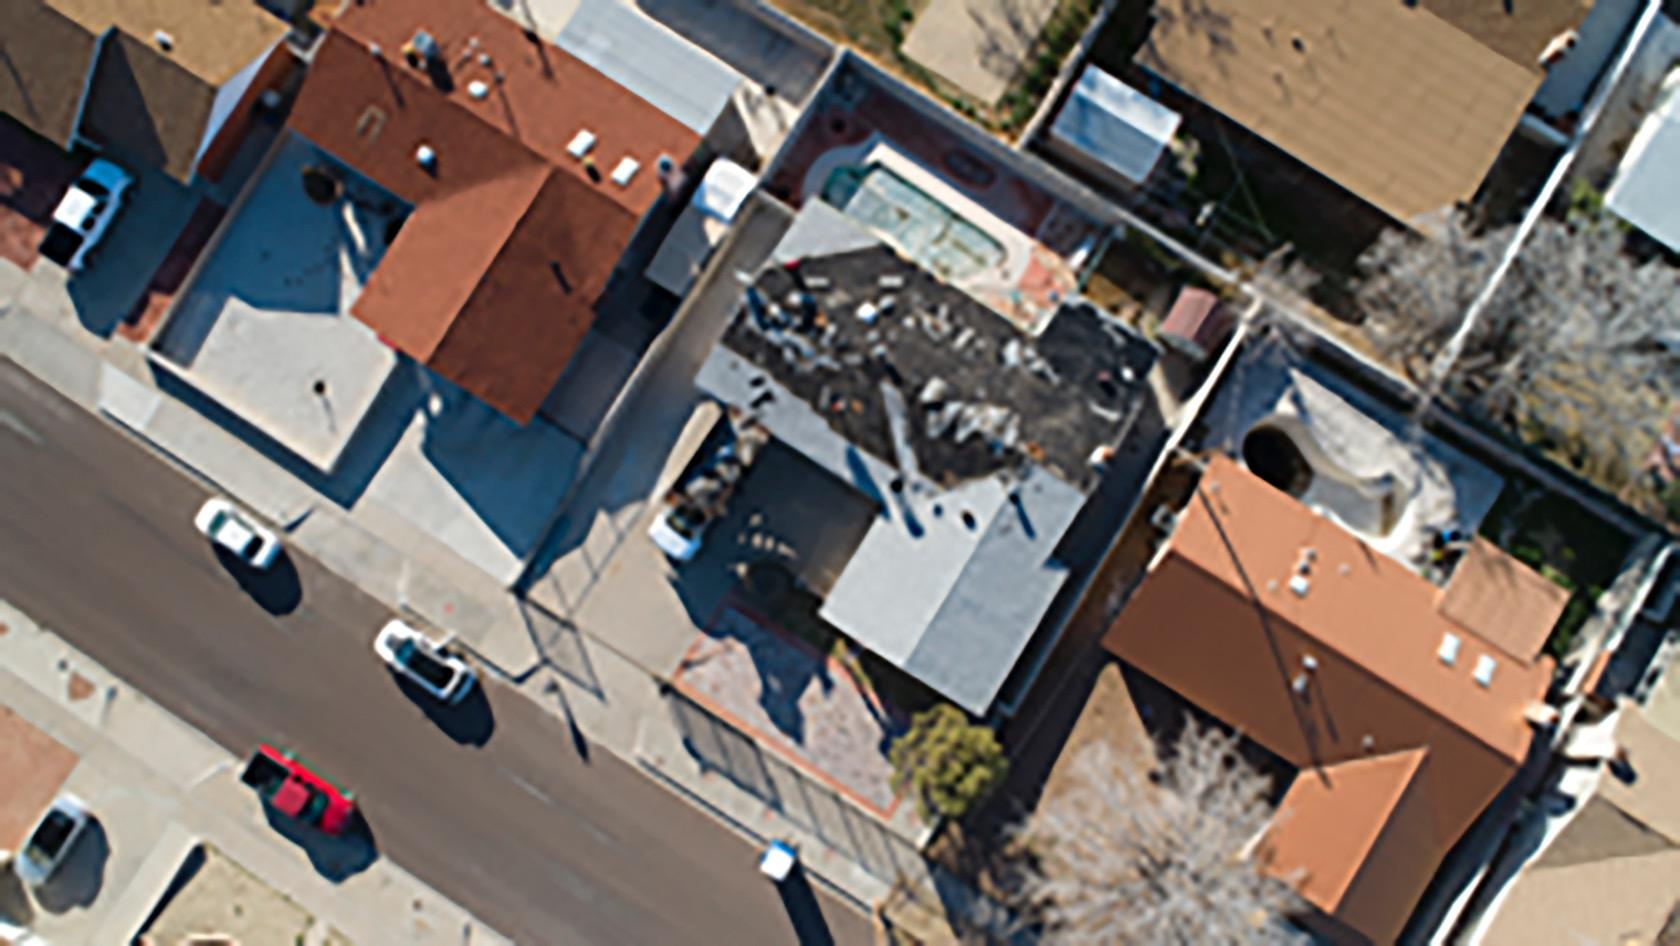 Professional Roofers & Contractors image 20